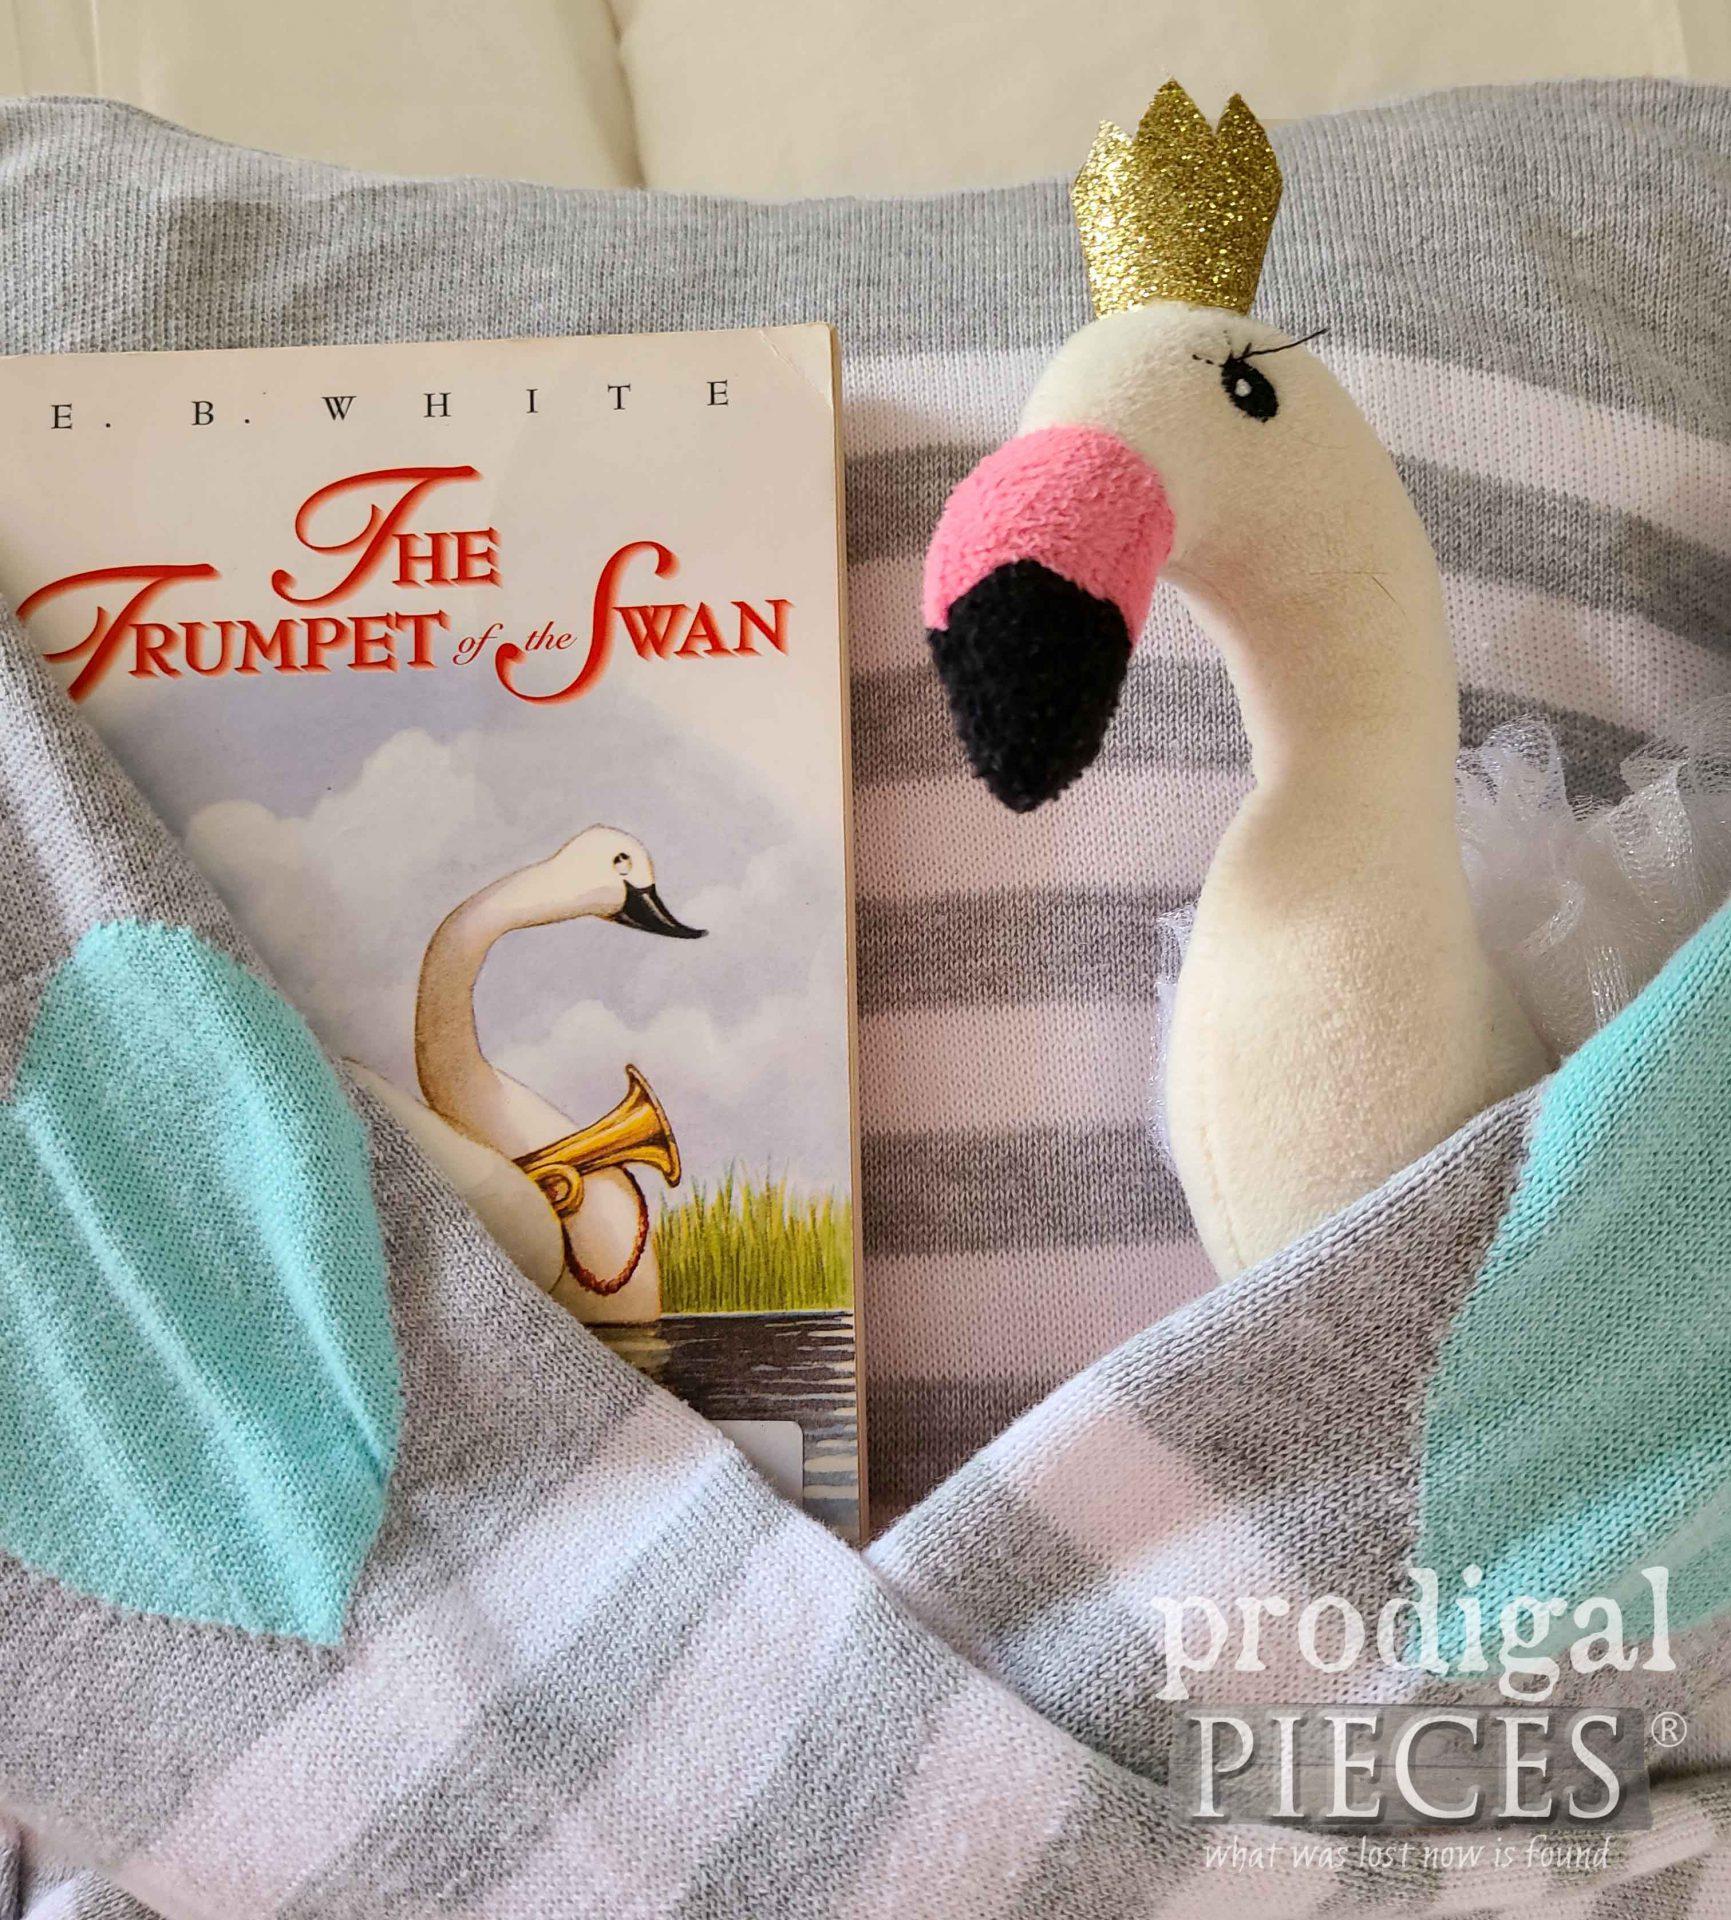 Adorable DIY Pocket Pillow by Larissa of Prodigal Pieces | prodigalpieces.com #prodigalpieces #diy #refashion #giftidea #home #homedecor